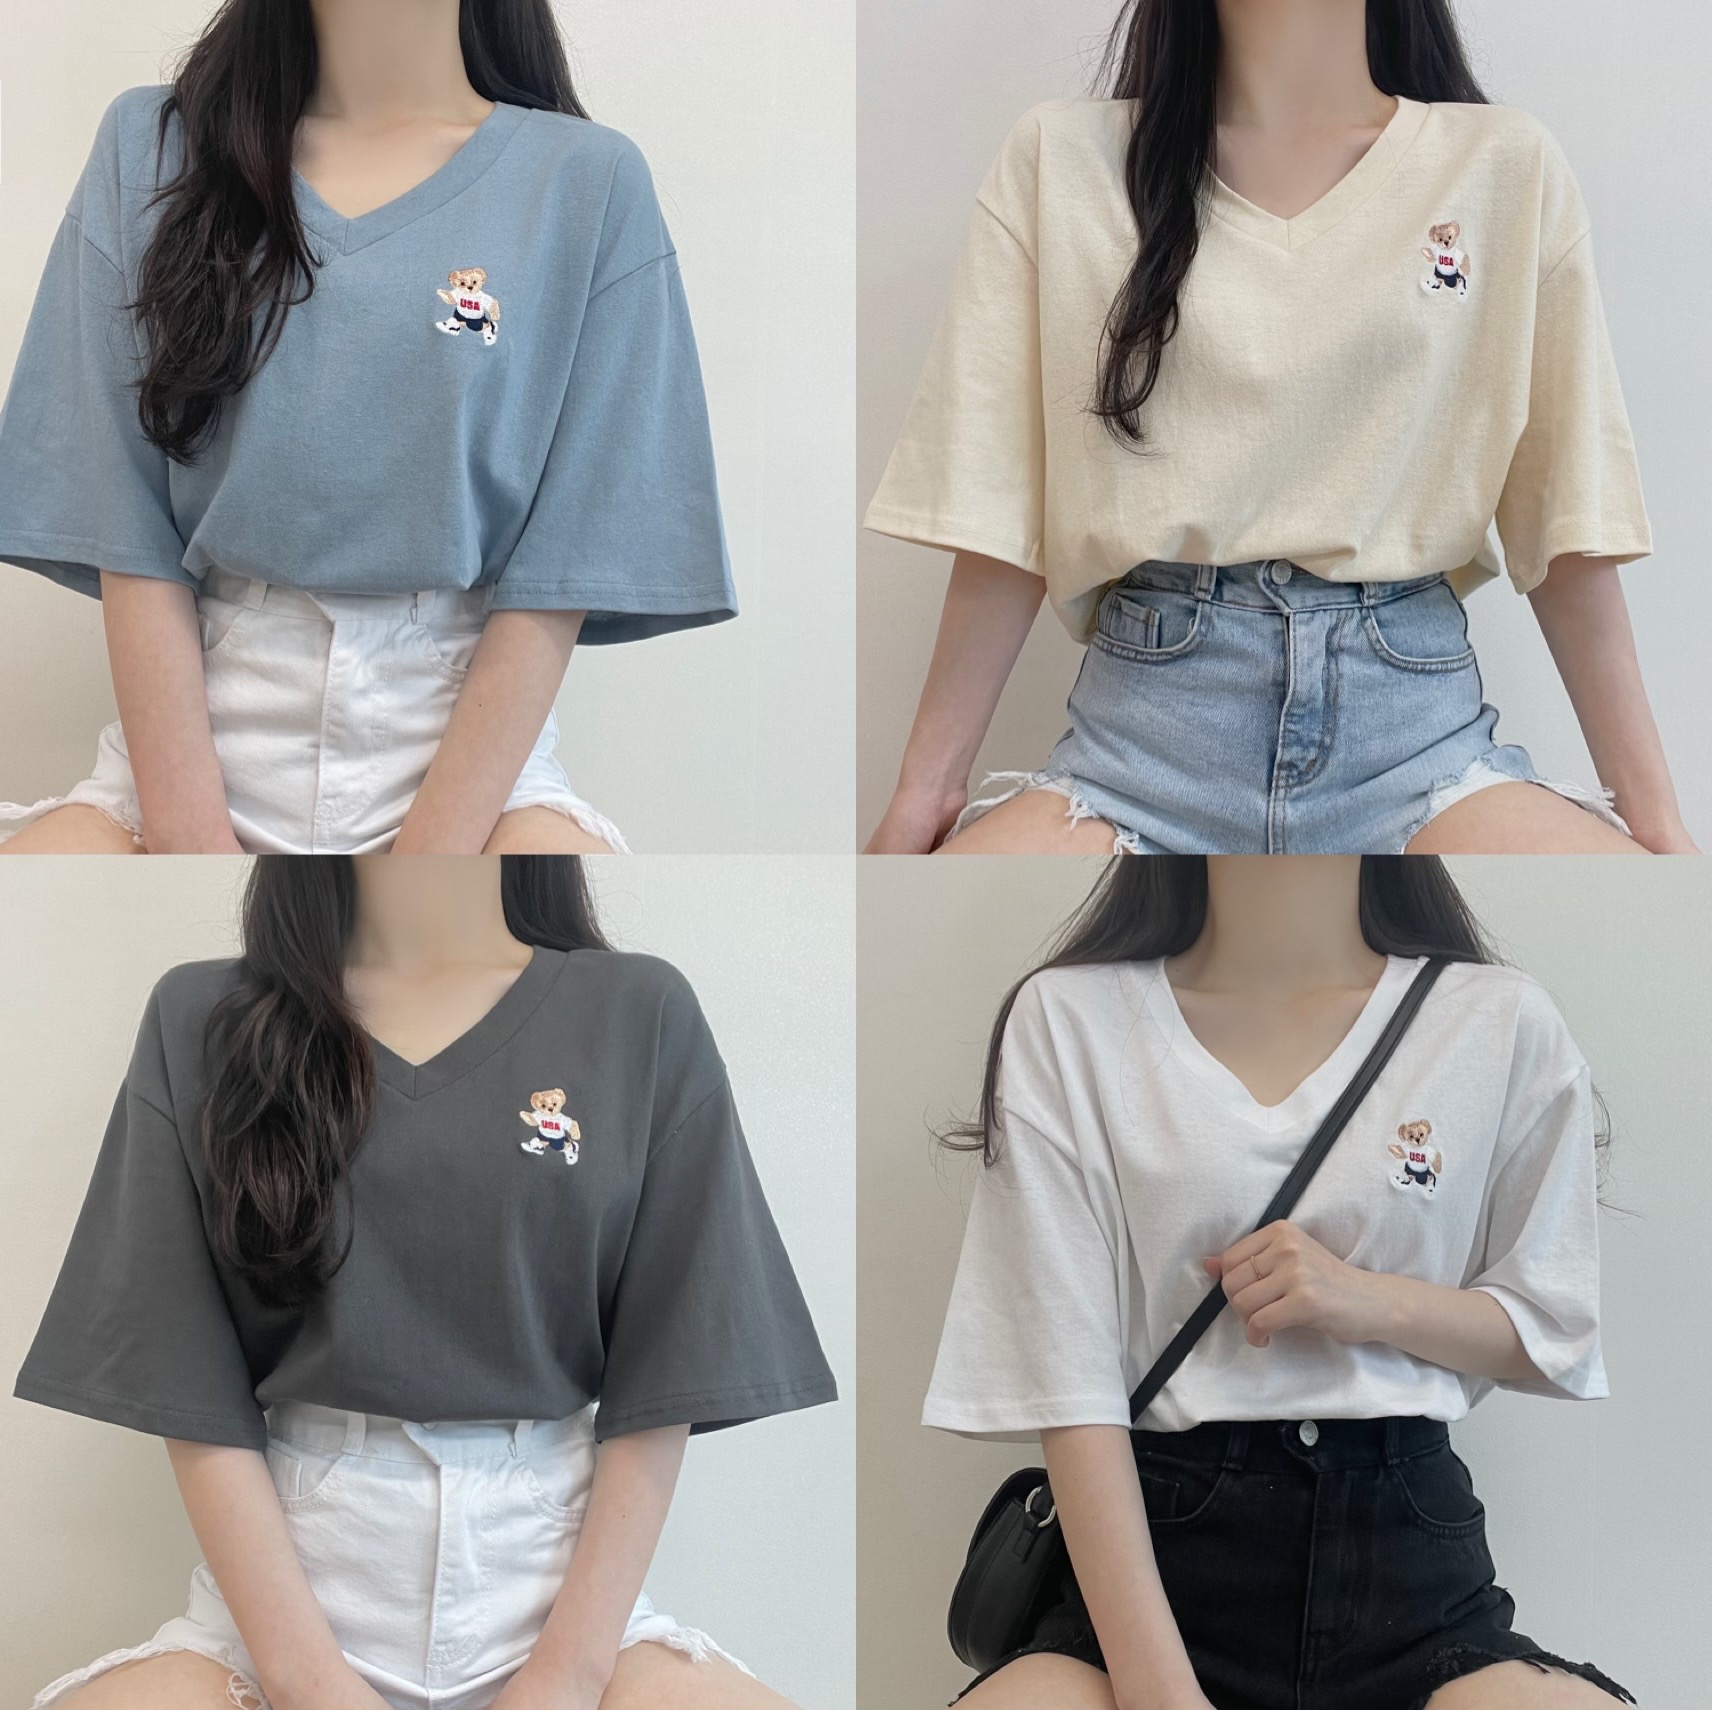 Shall we wear it together, bare embroidered V-Neck -fit short-sleeved T-shirt